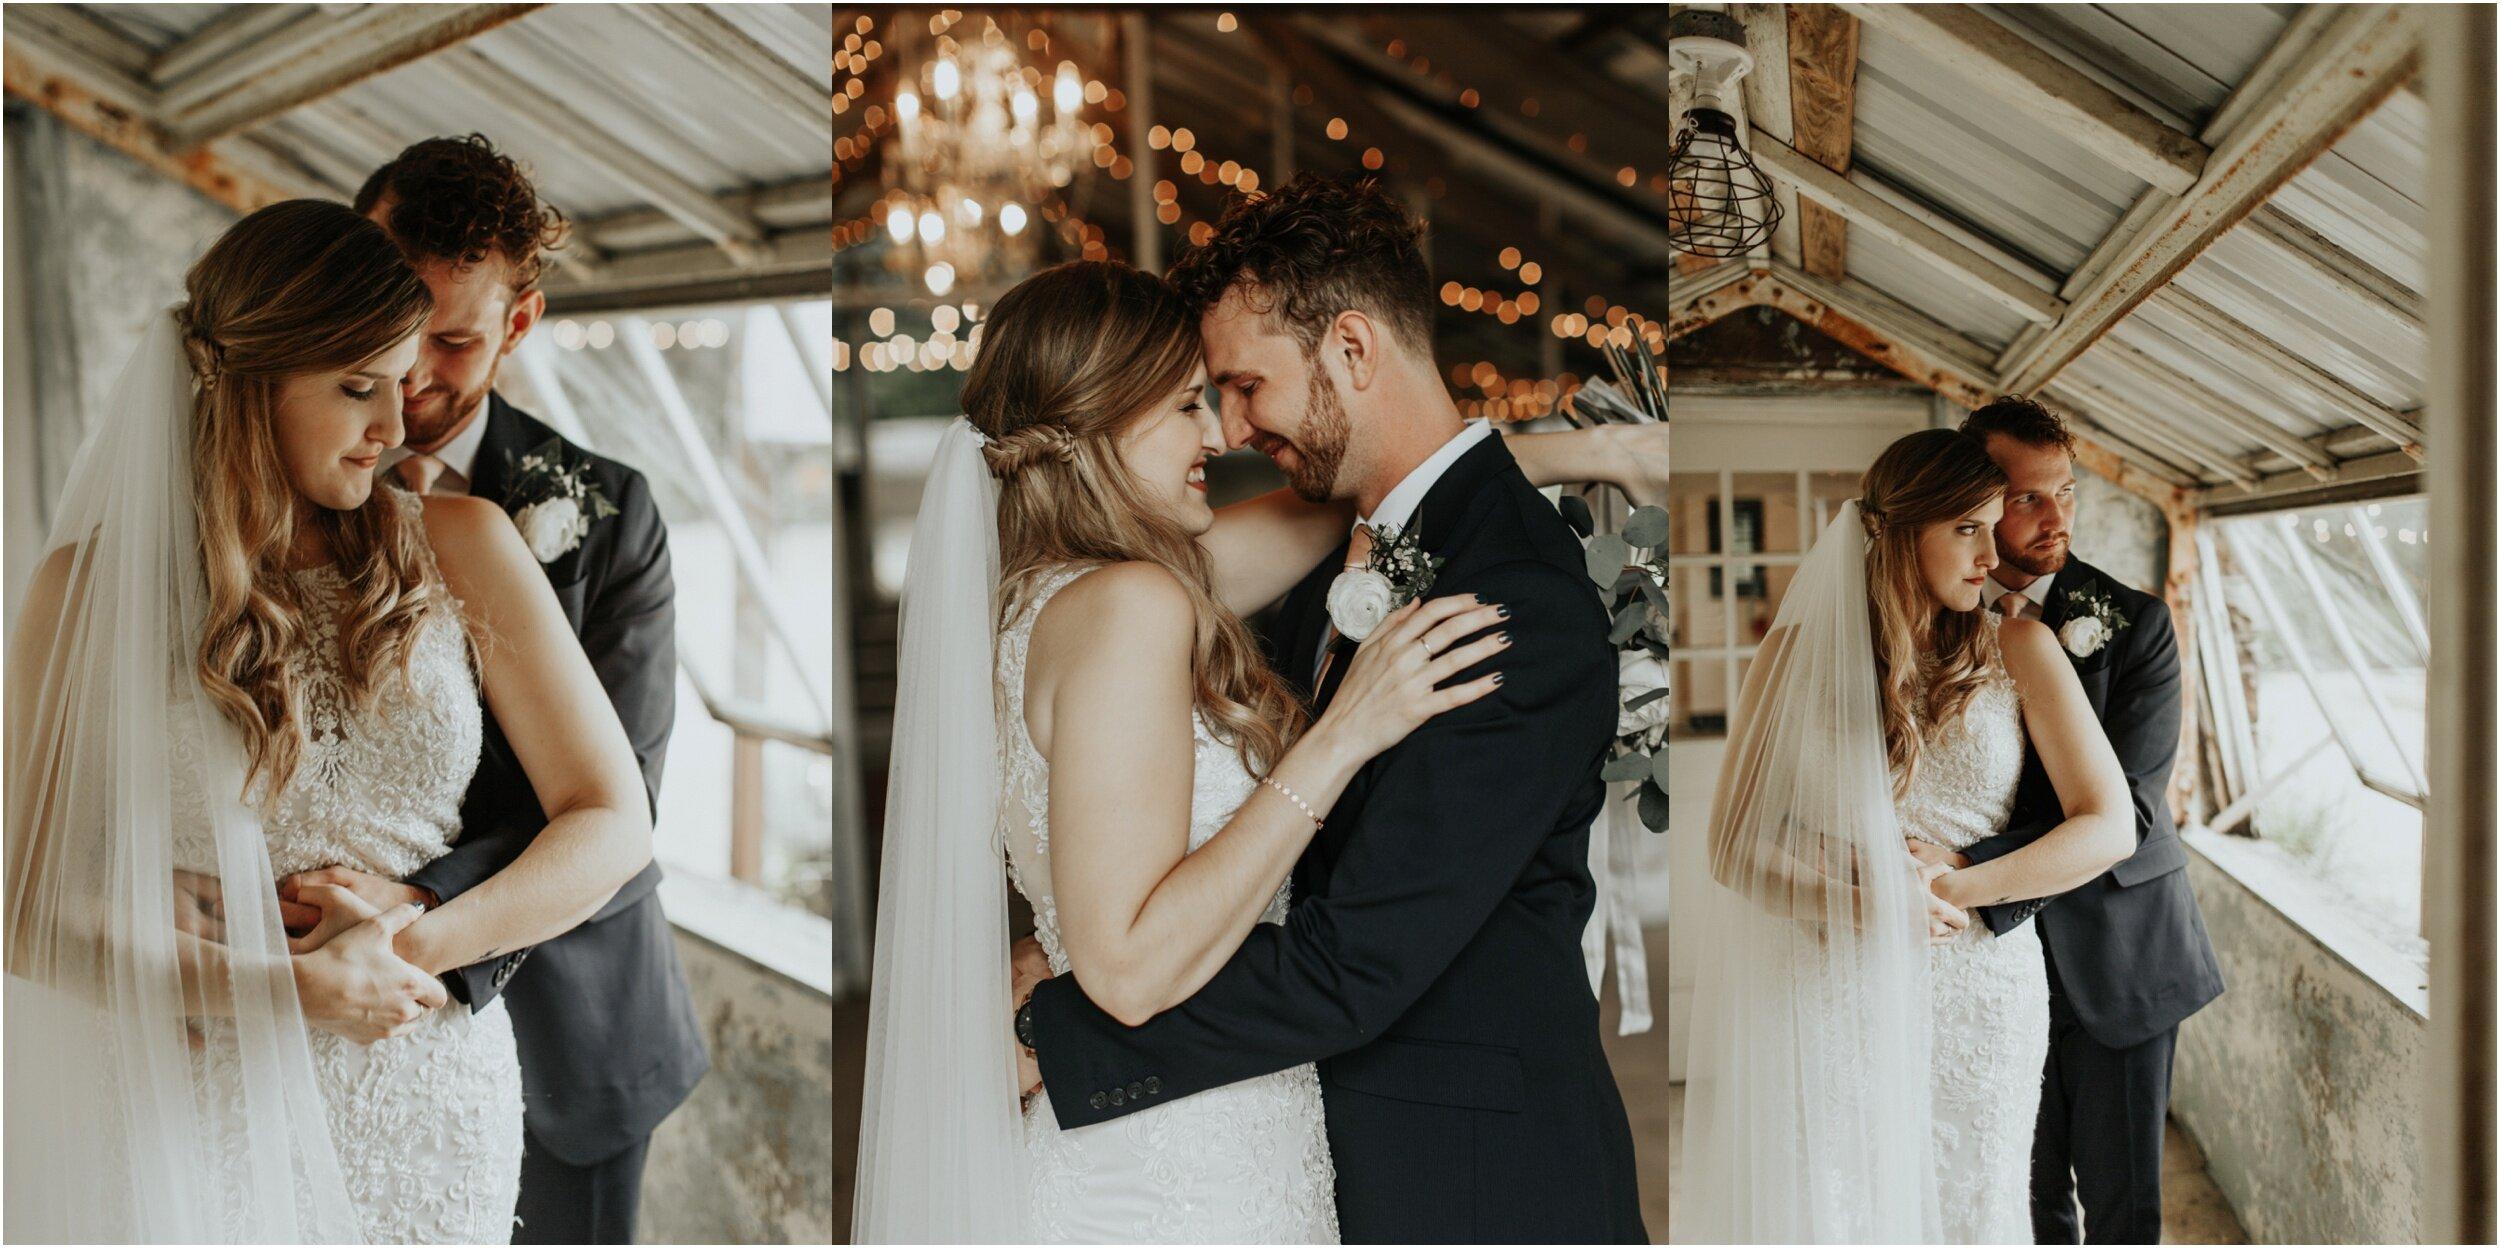 steph-and-jordan-cox-our-wedding-historic-shady-lane-compass-wedding-collective-hazel-lining-photography-destination-elopement-wedding-engagement-photography_0038.jpg